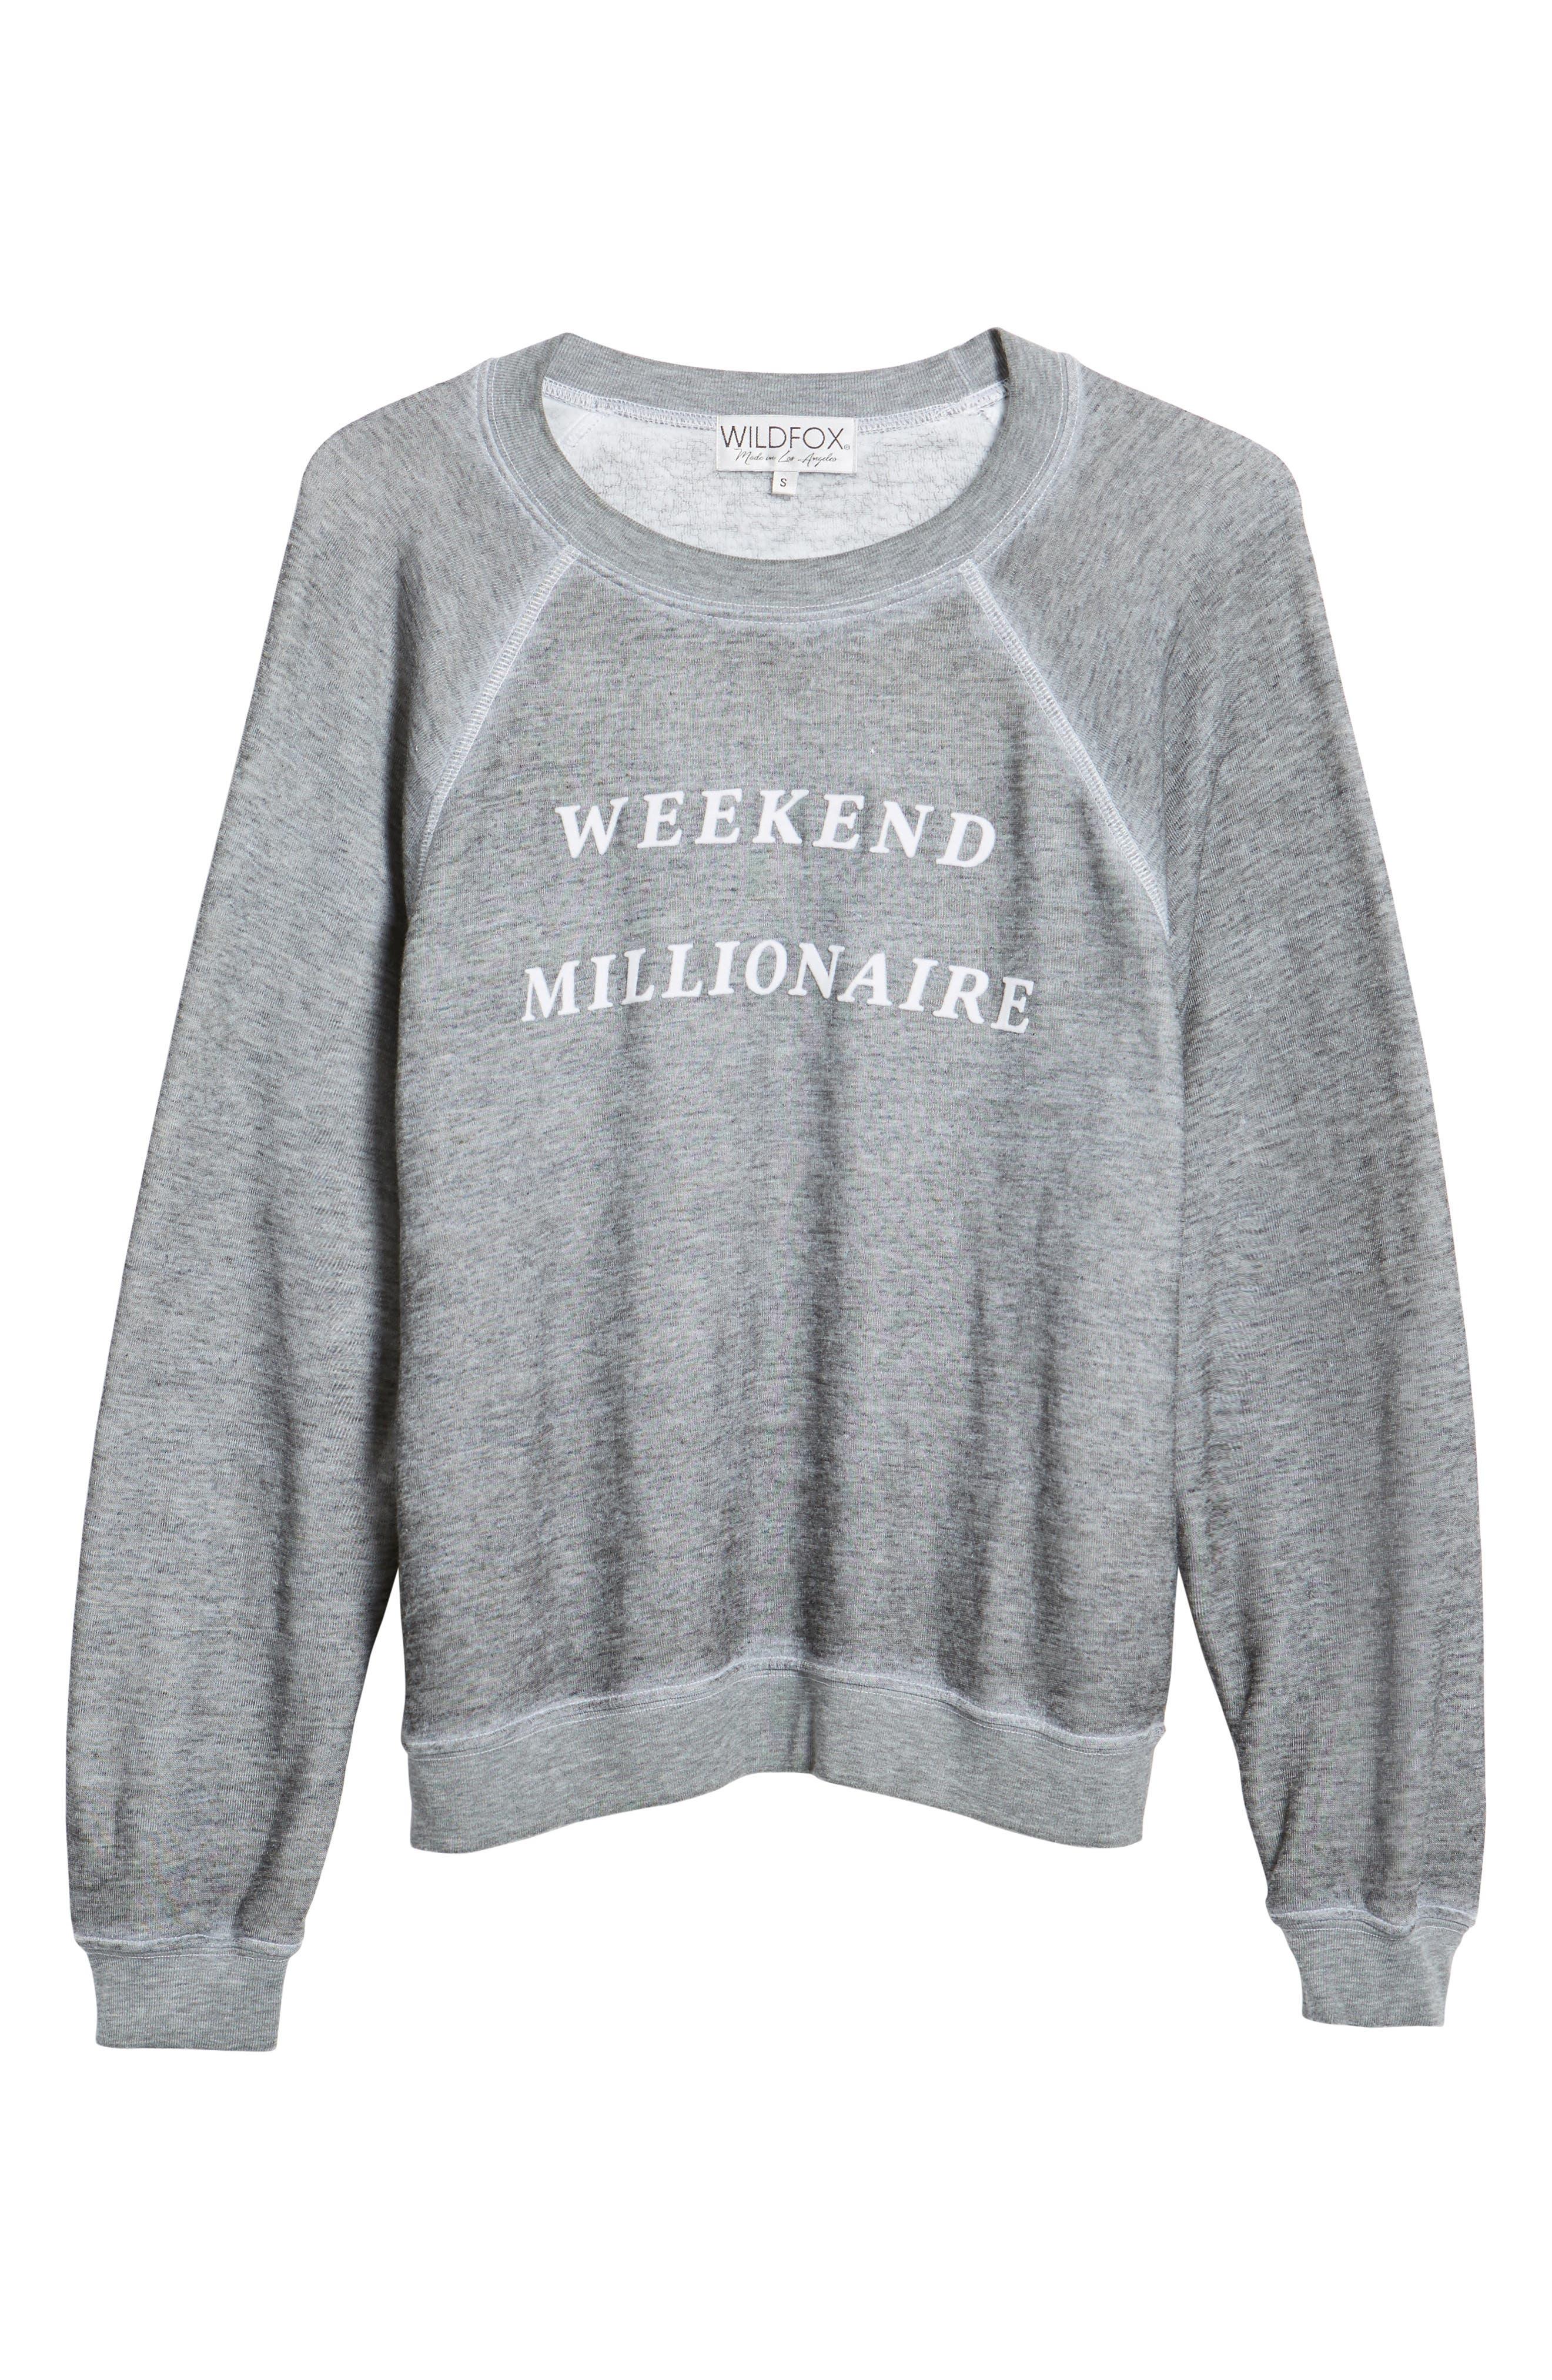 Weekend Millionaire Sweatshirt,                             Alternate thumbnail 6, color,                             020